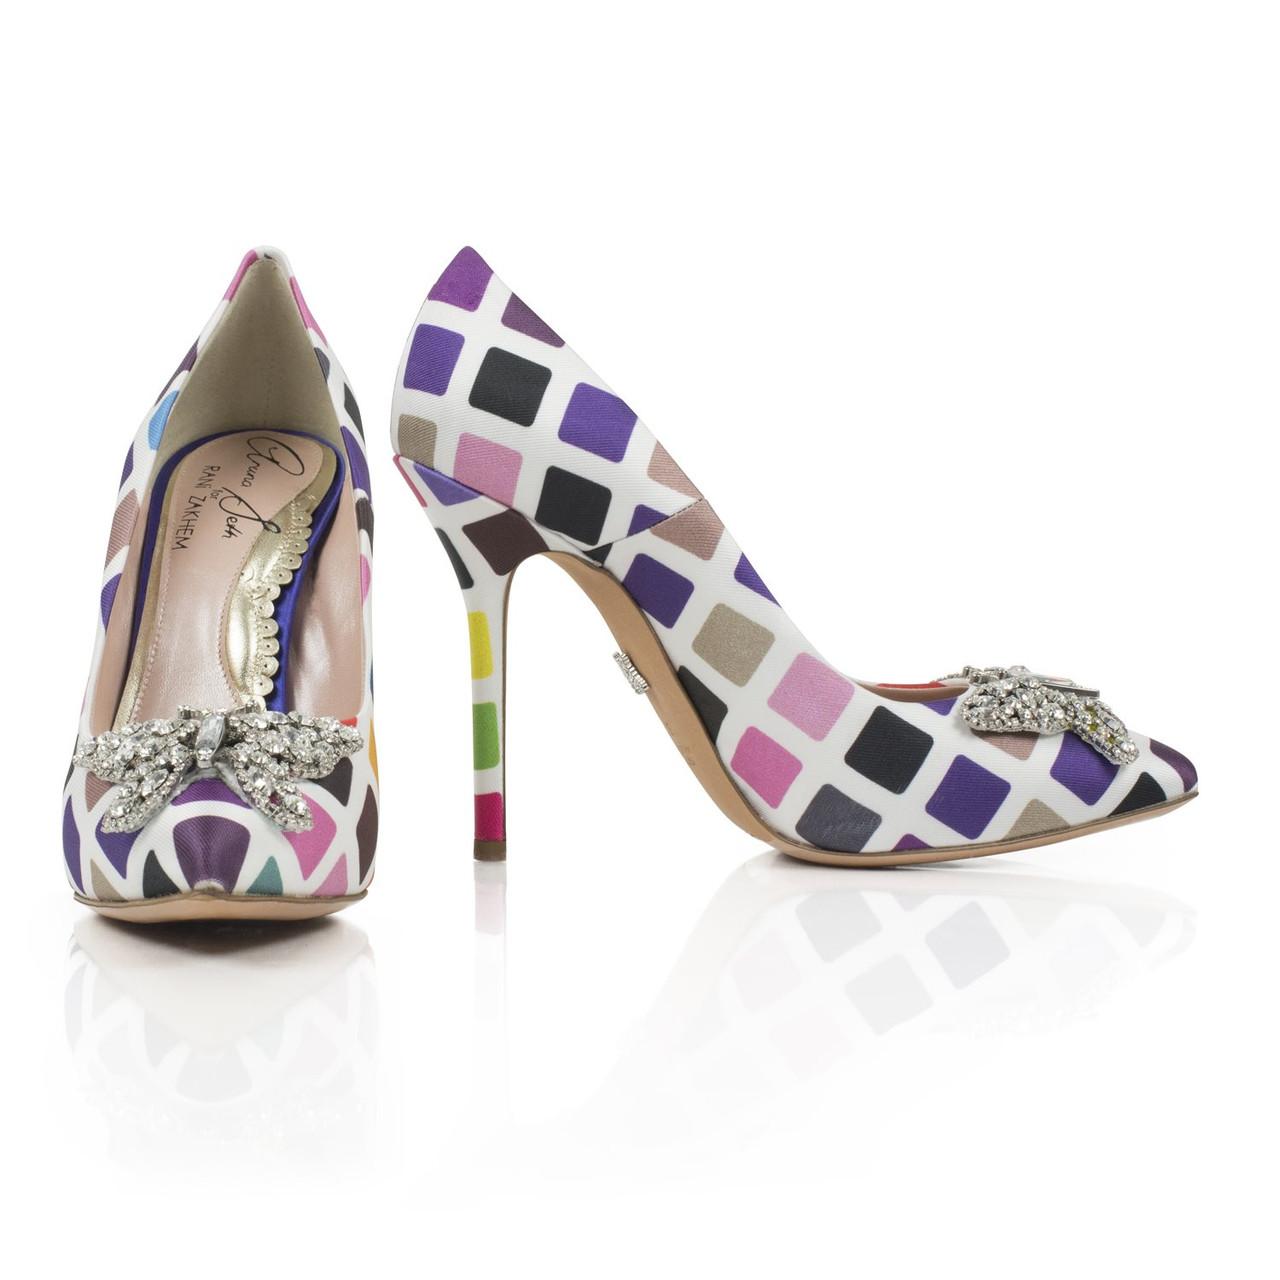 Farfalla Limited Edition Rainbow Rani Couture Pointy